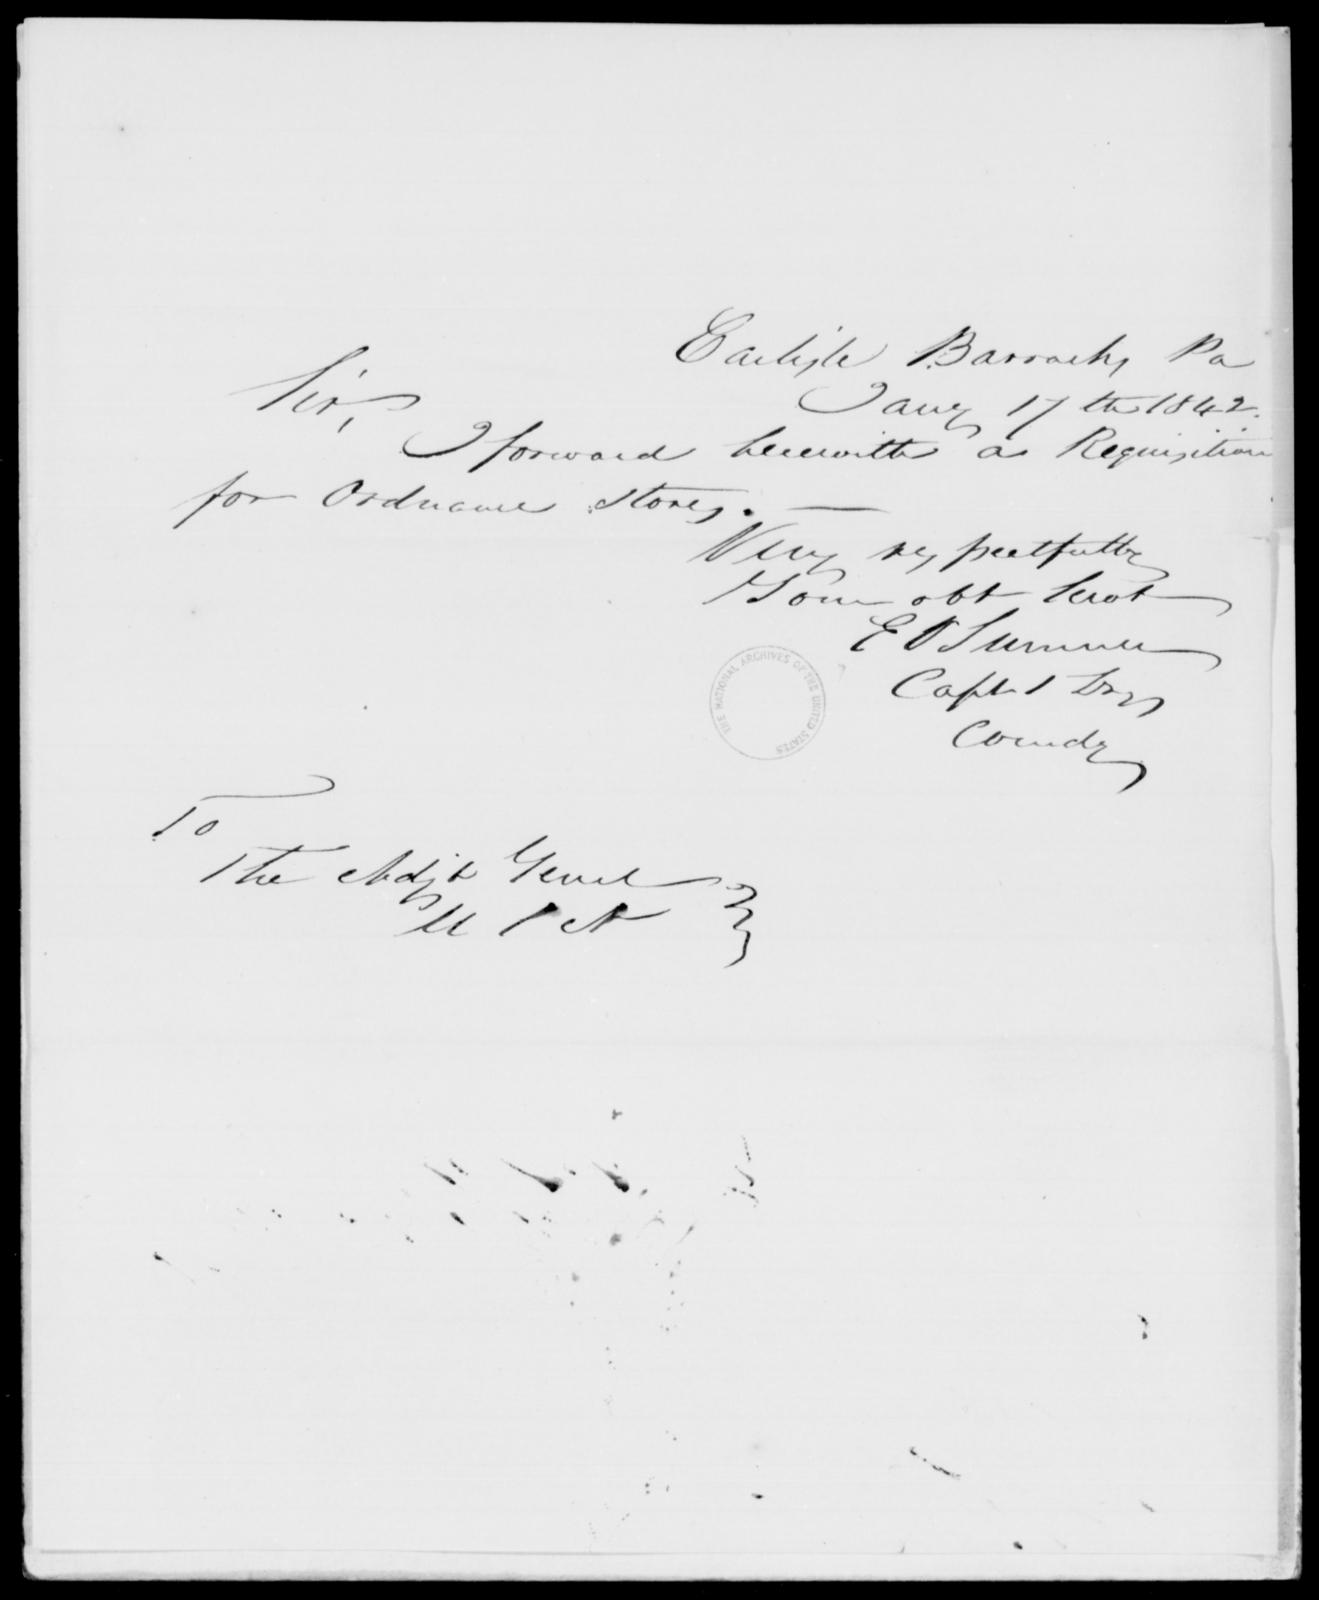 Sumner, E V - State: Pennsylvania - Year: 1842 - File Number: S14